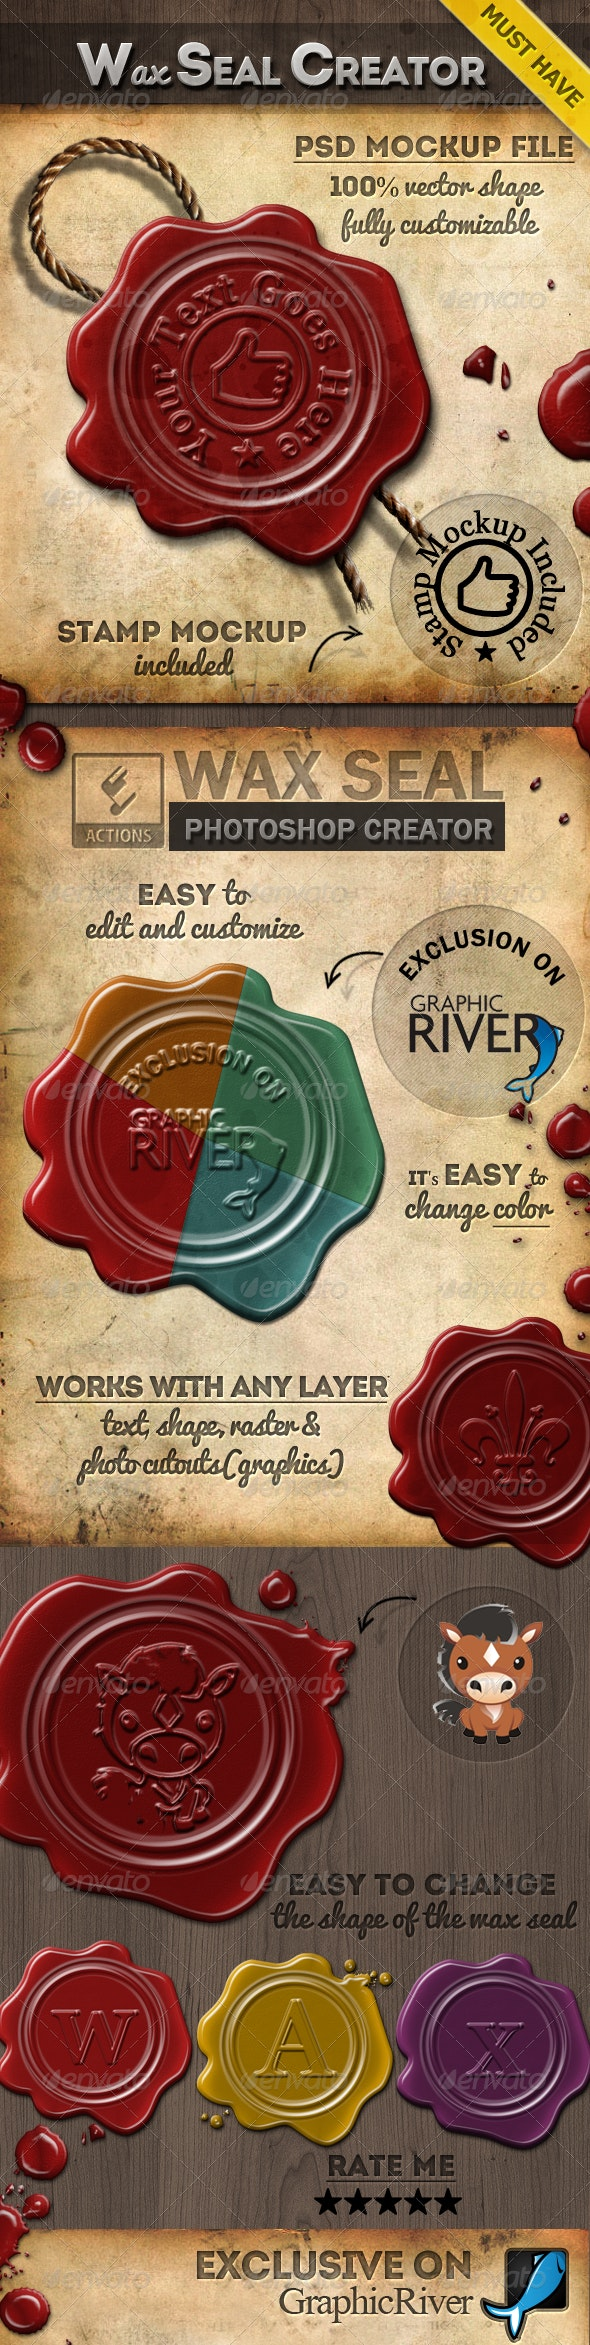 Wax Stamp Seal Photoshop Creator - Utilities Actions